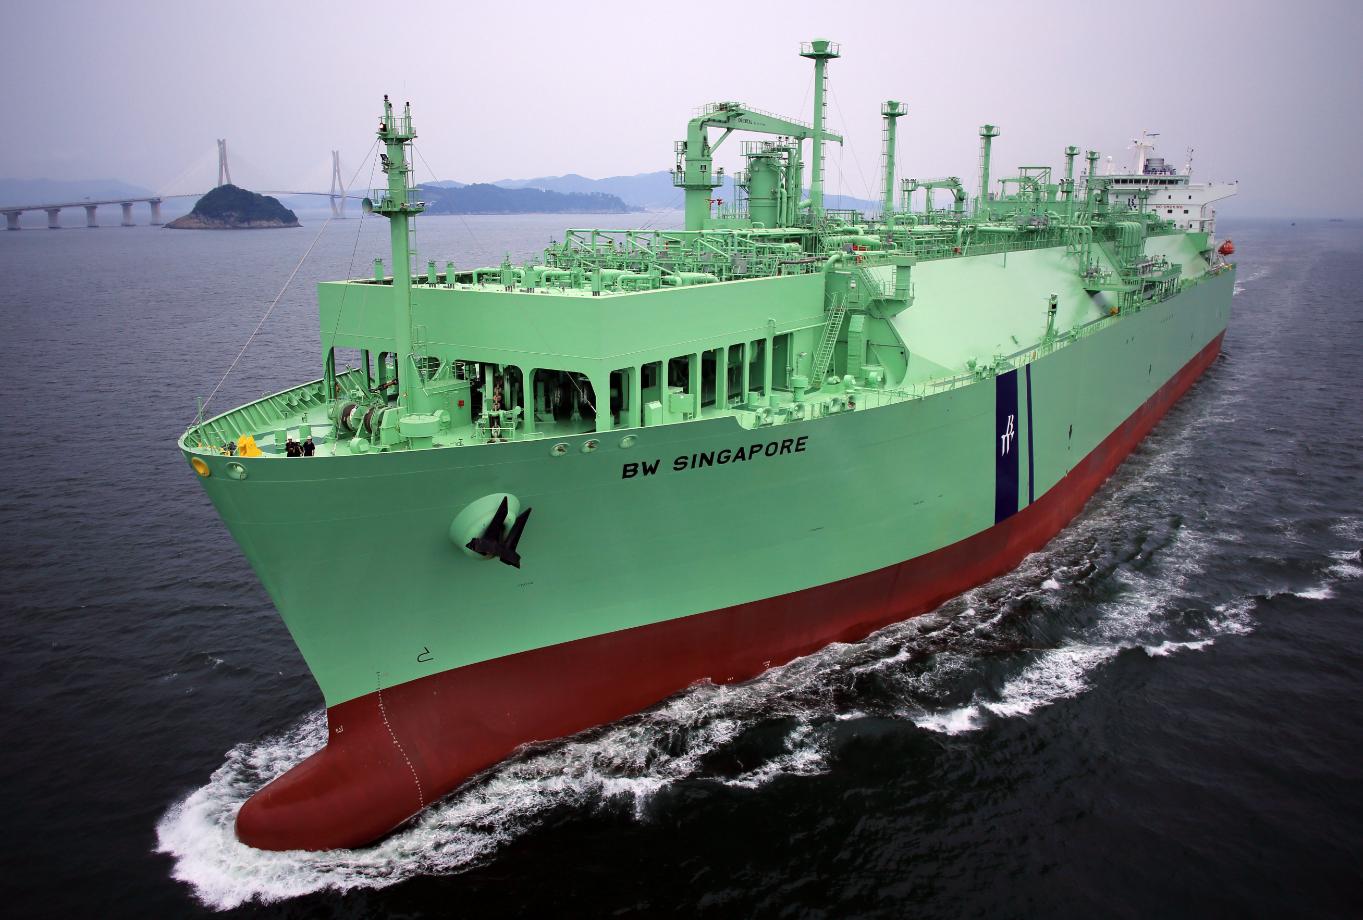 BW's Singapore LNG tanker